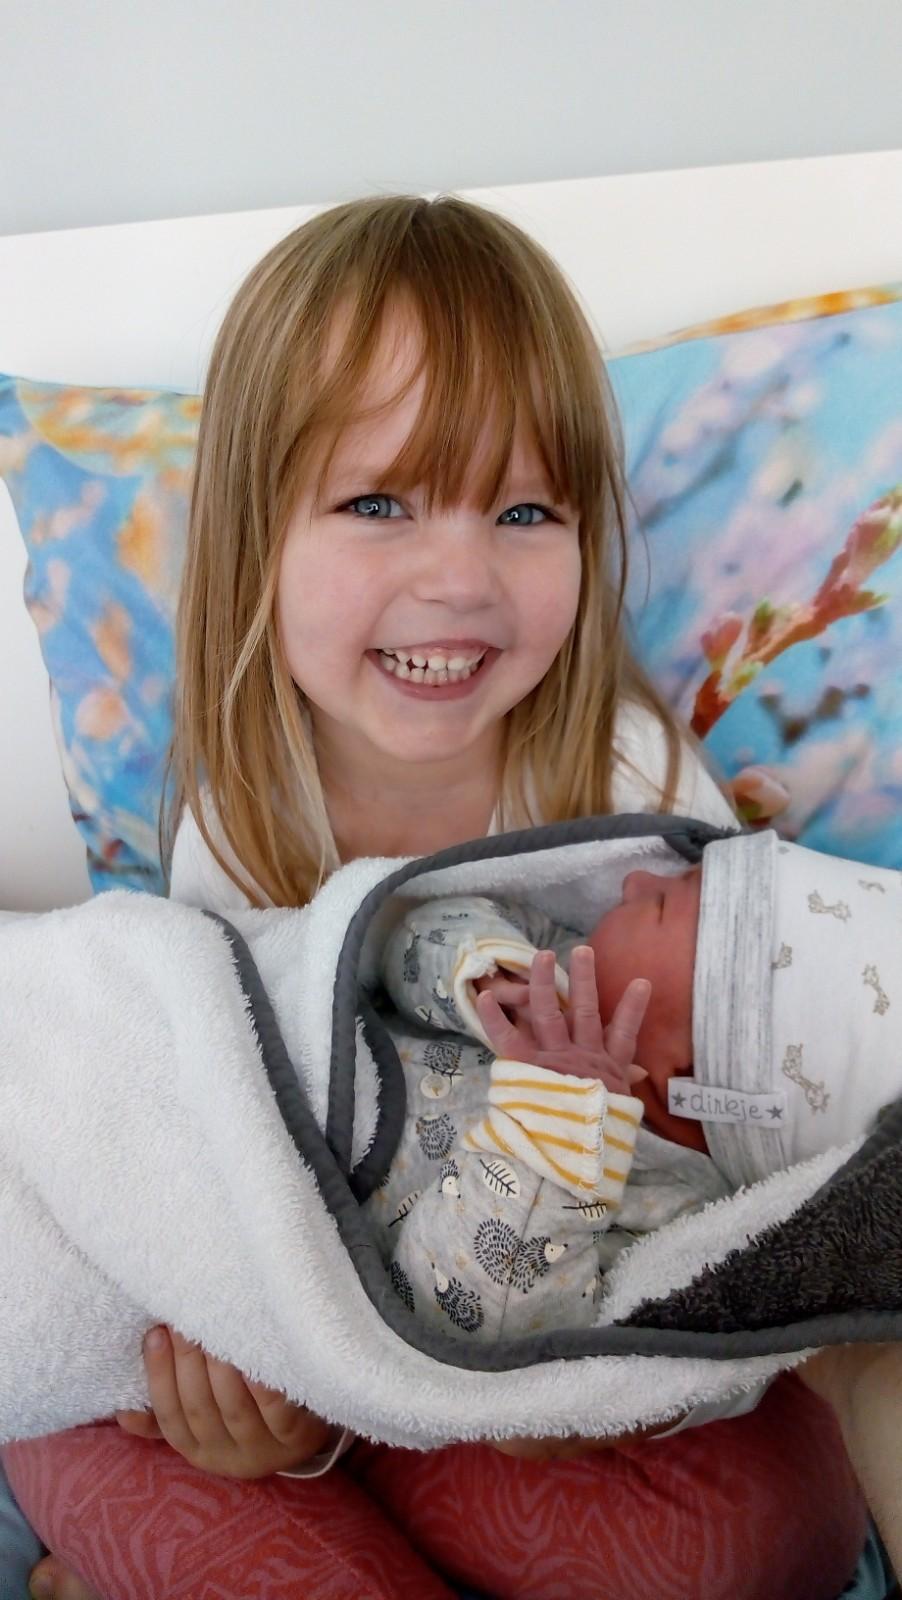 kraamweek, kraamtijd, bevallen, geboren, new-born, baby, mama, mamablog, gezin, momlife, lalog, mamalifestyle, lalogblog, lalog.nl